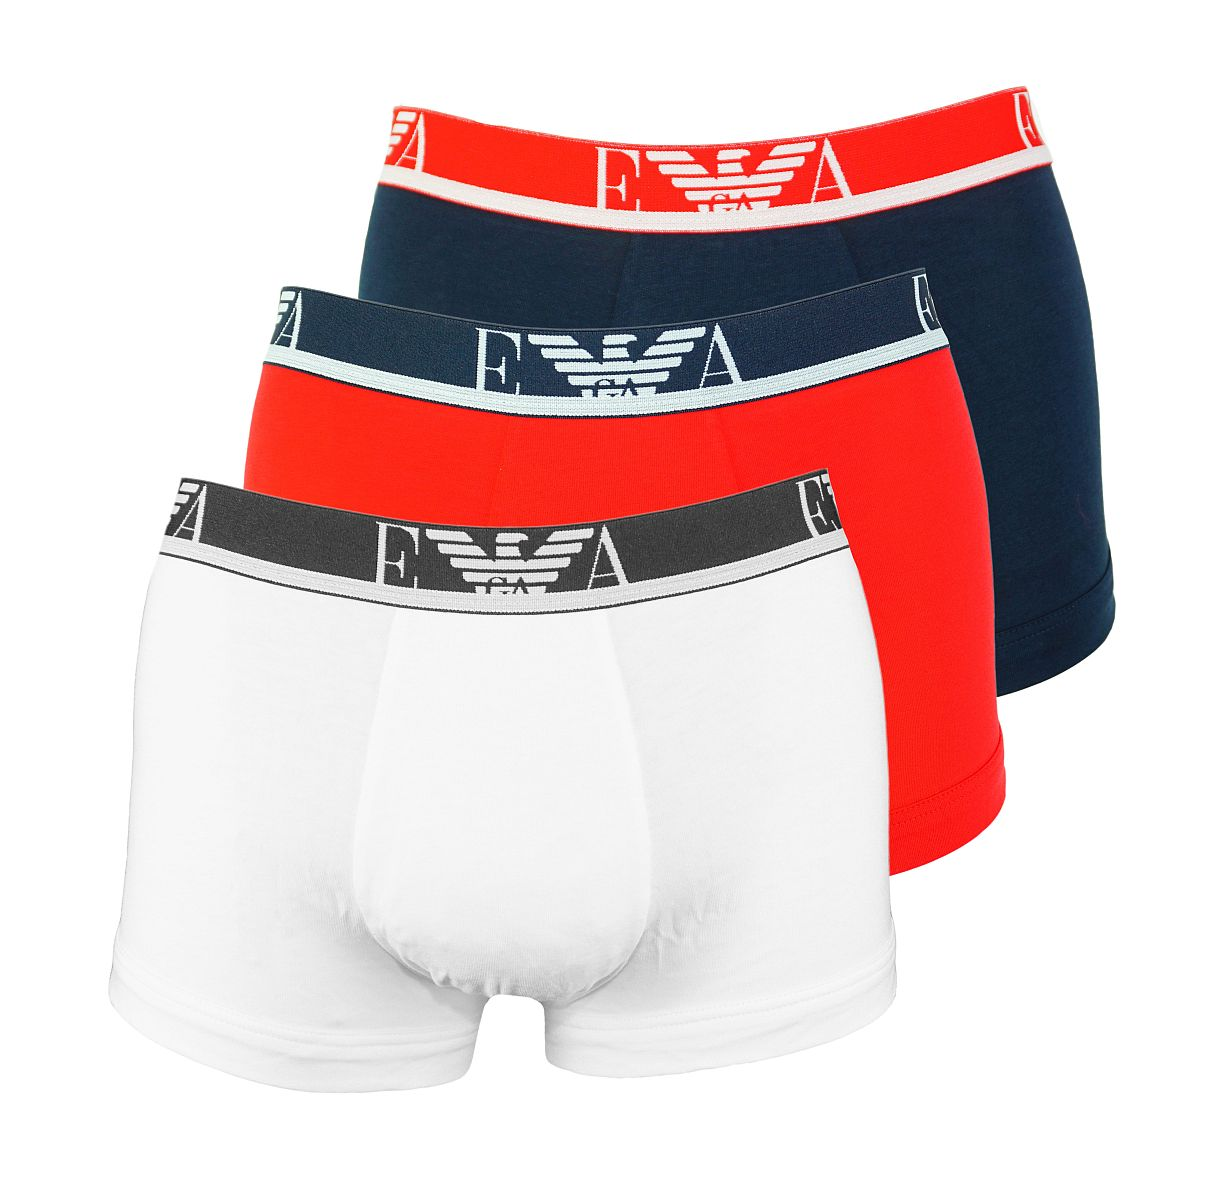 Emporio Armani 3er Pack Shorts Trunk Unterhose 111357 8P715 50710 BIANCO/MAR/TANGO RED W18-EATZ1